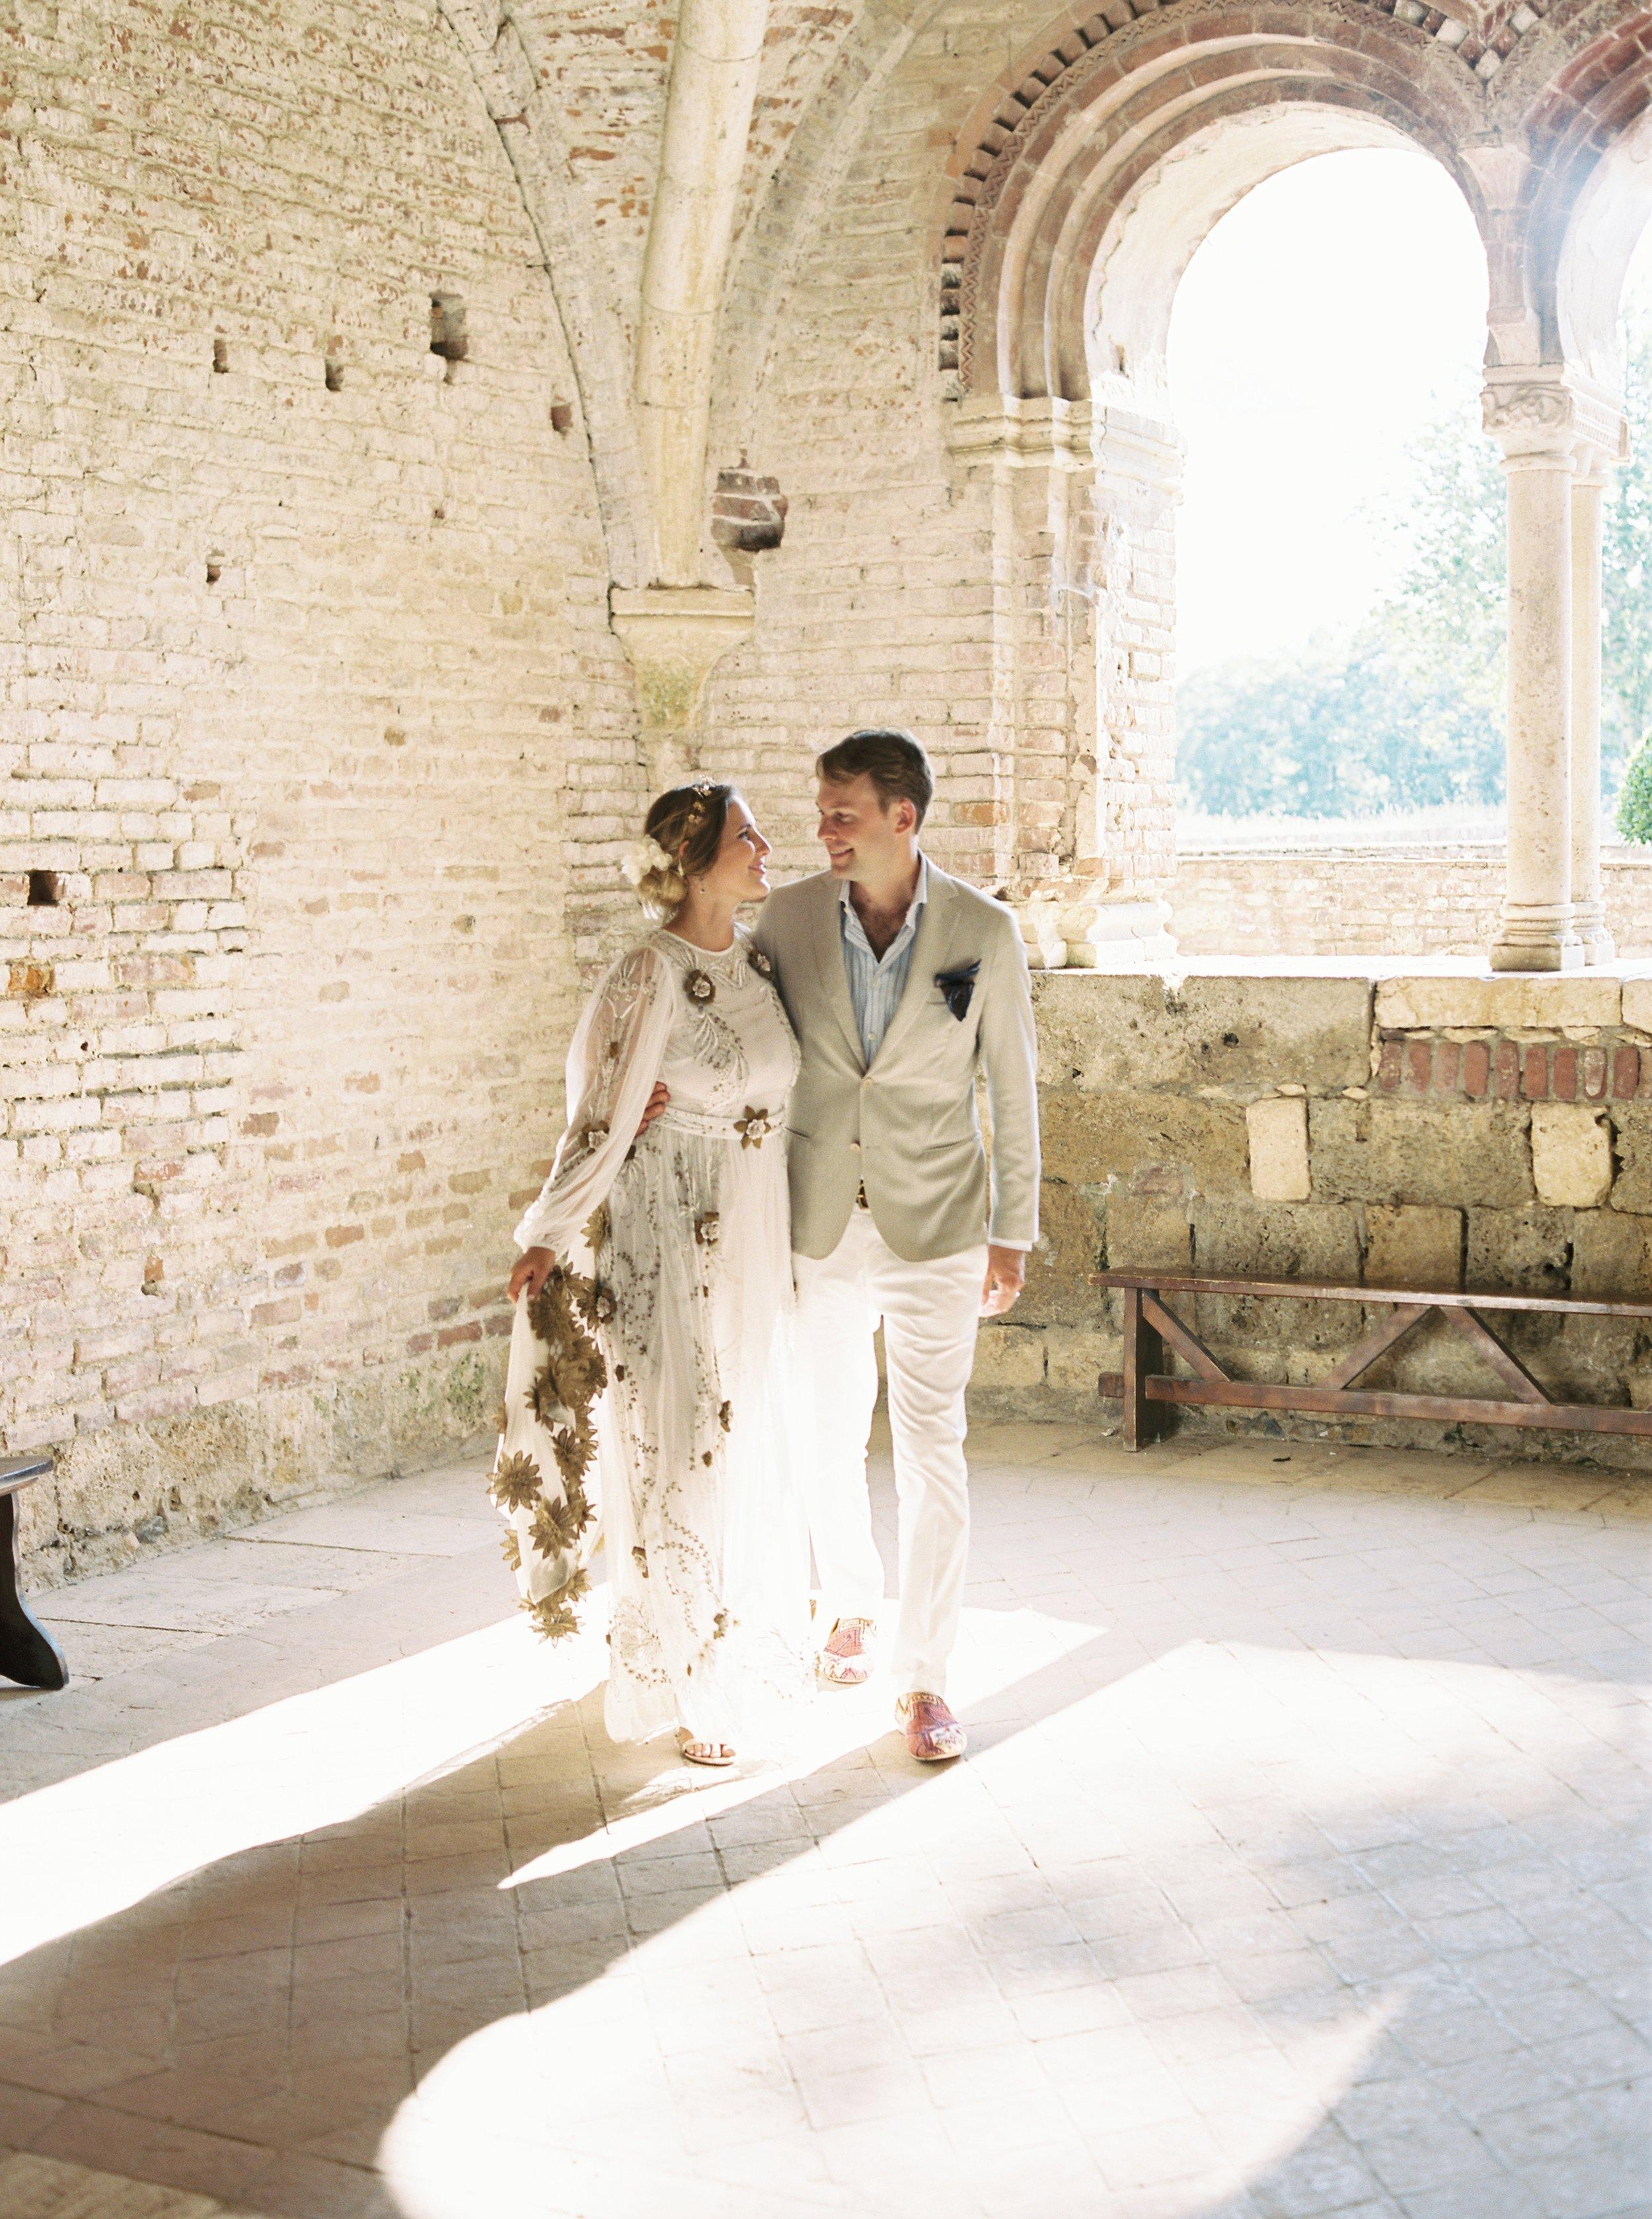 Kyle John l Fine Art Wedding Photography l Chicago, Copenhagen, California, New York, Destination l Blog l Alexis and Zach_Borgo Santo Pietro_Italy_Tuscany_54